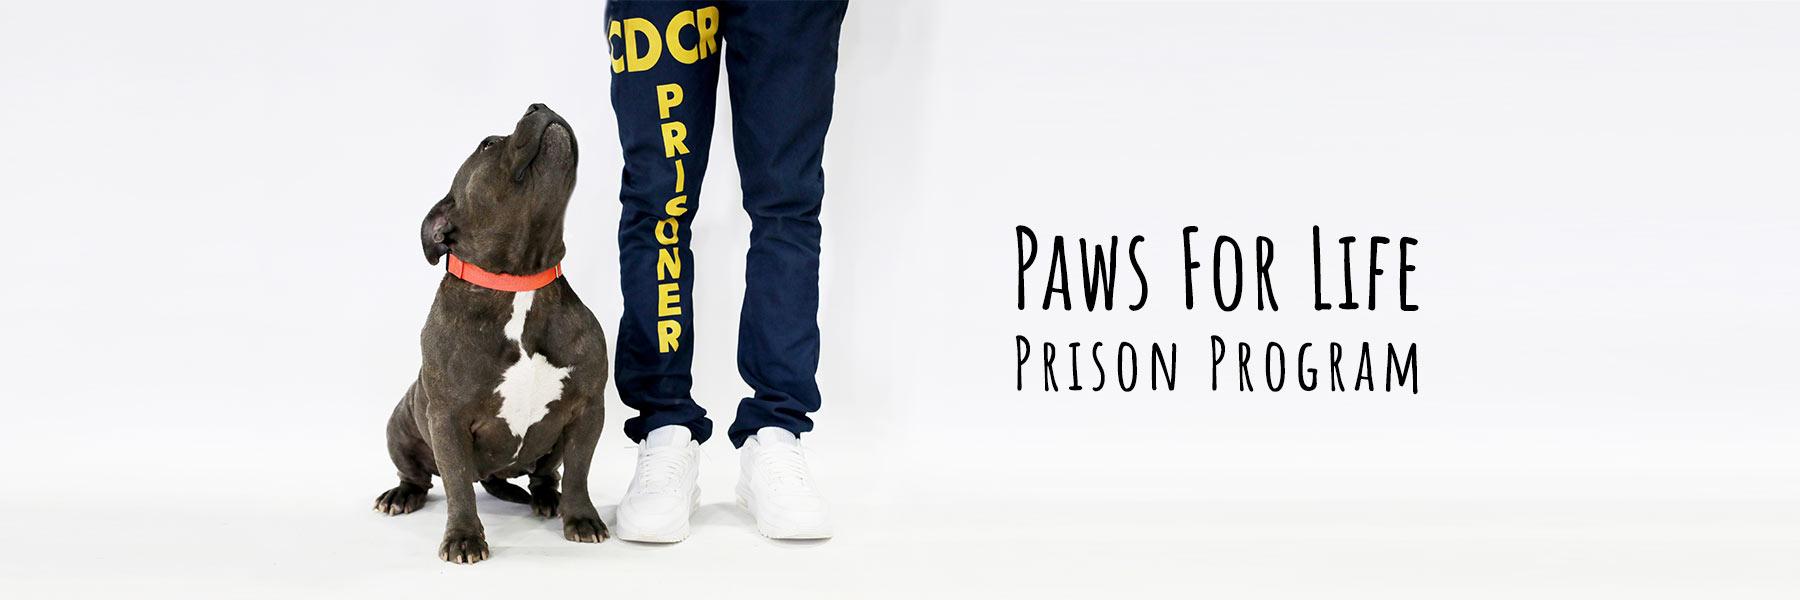 Paws For Life K9 Prison Program